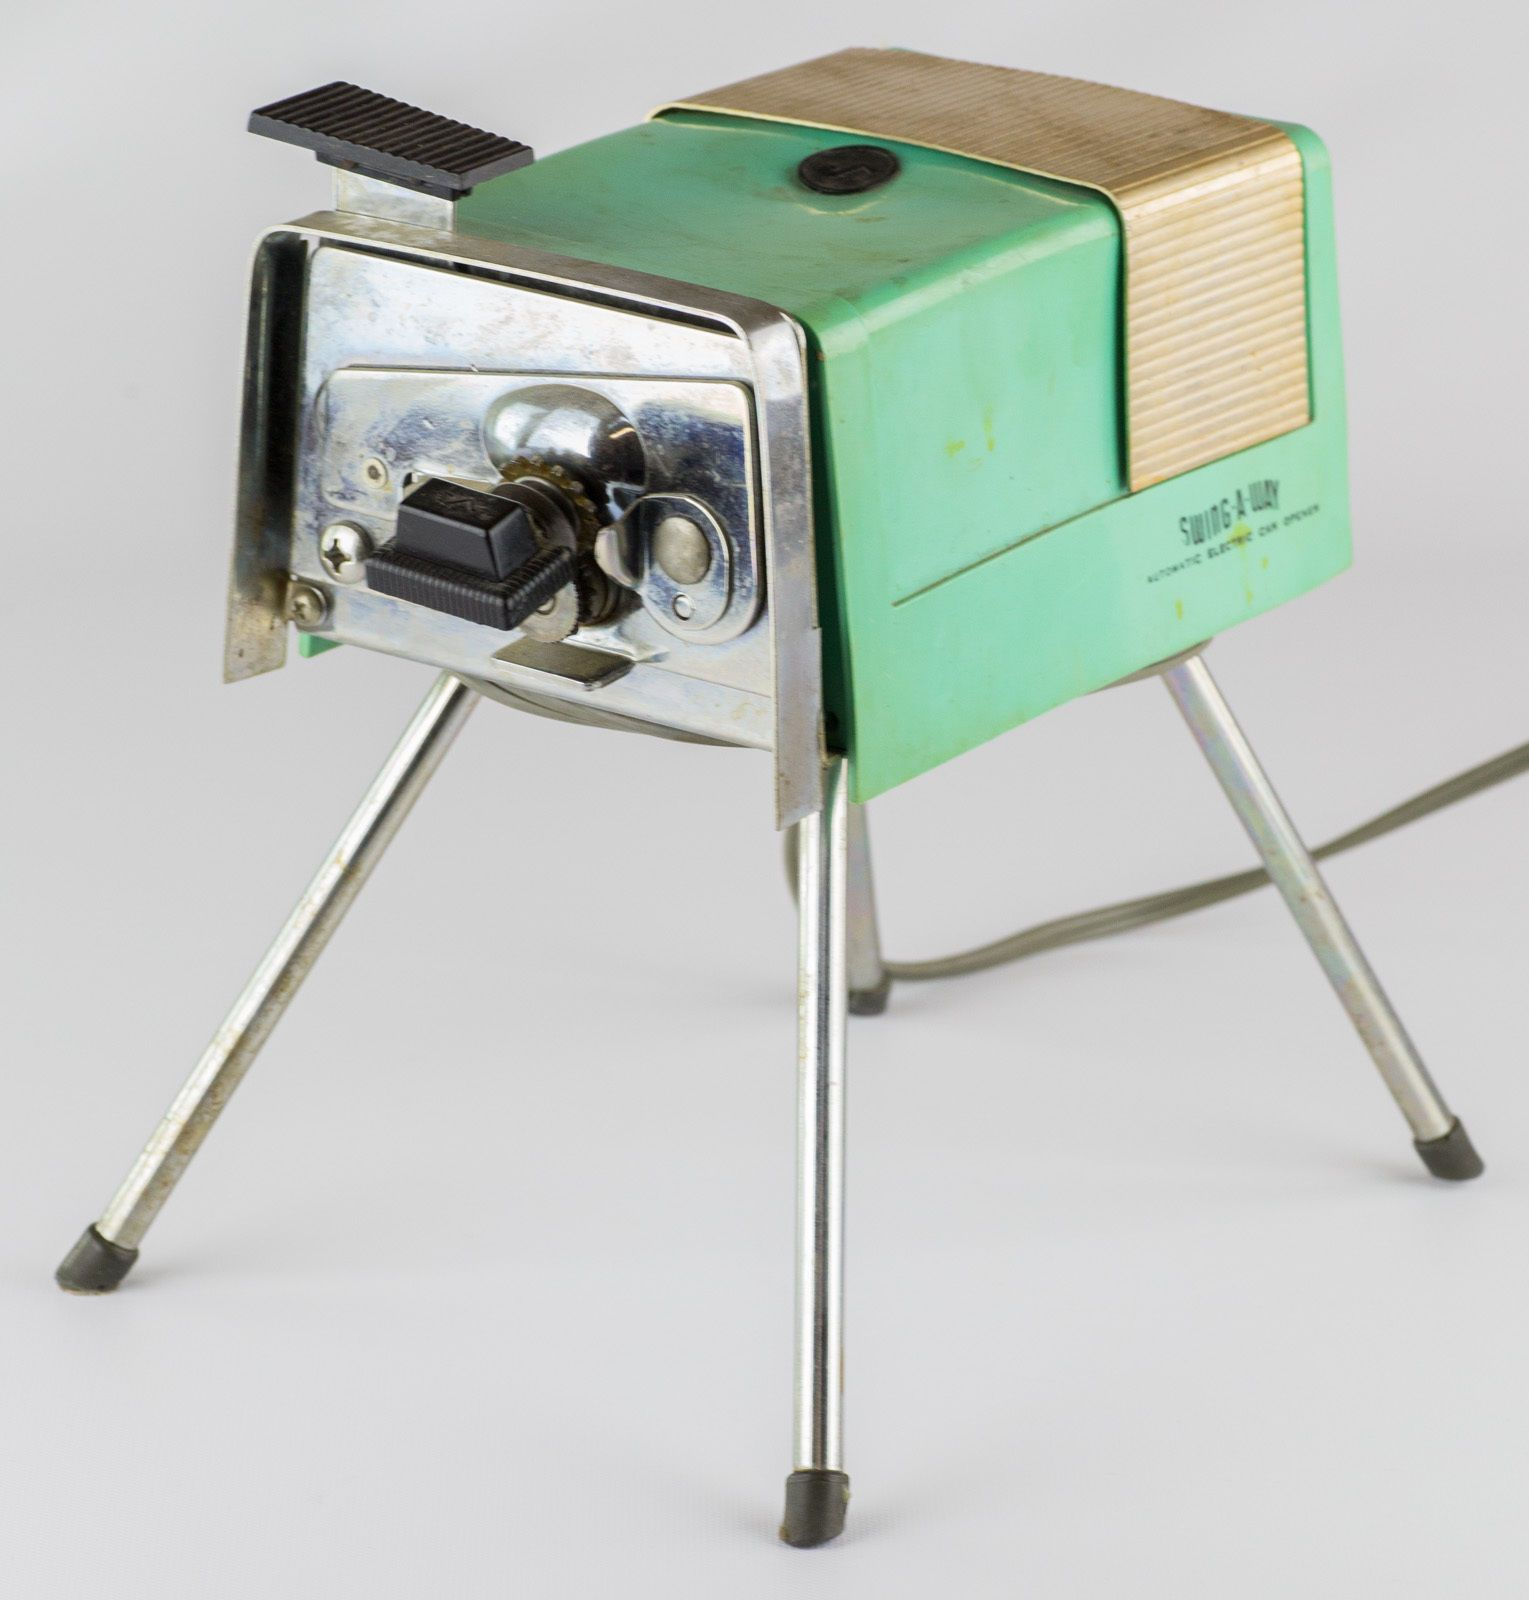 Erfreut 1950 S Rosa Küchengeräte Fotos - Küchenschrank Ideen ...